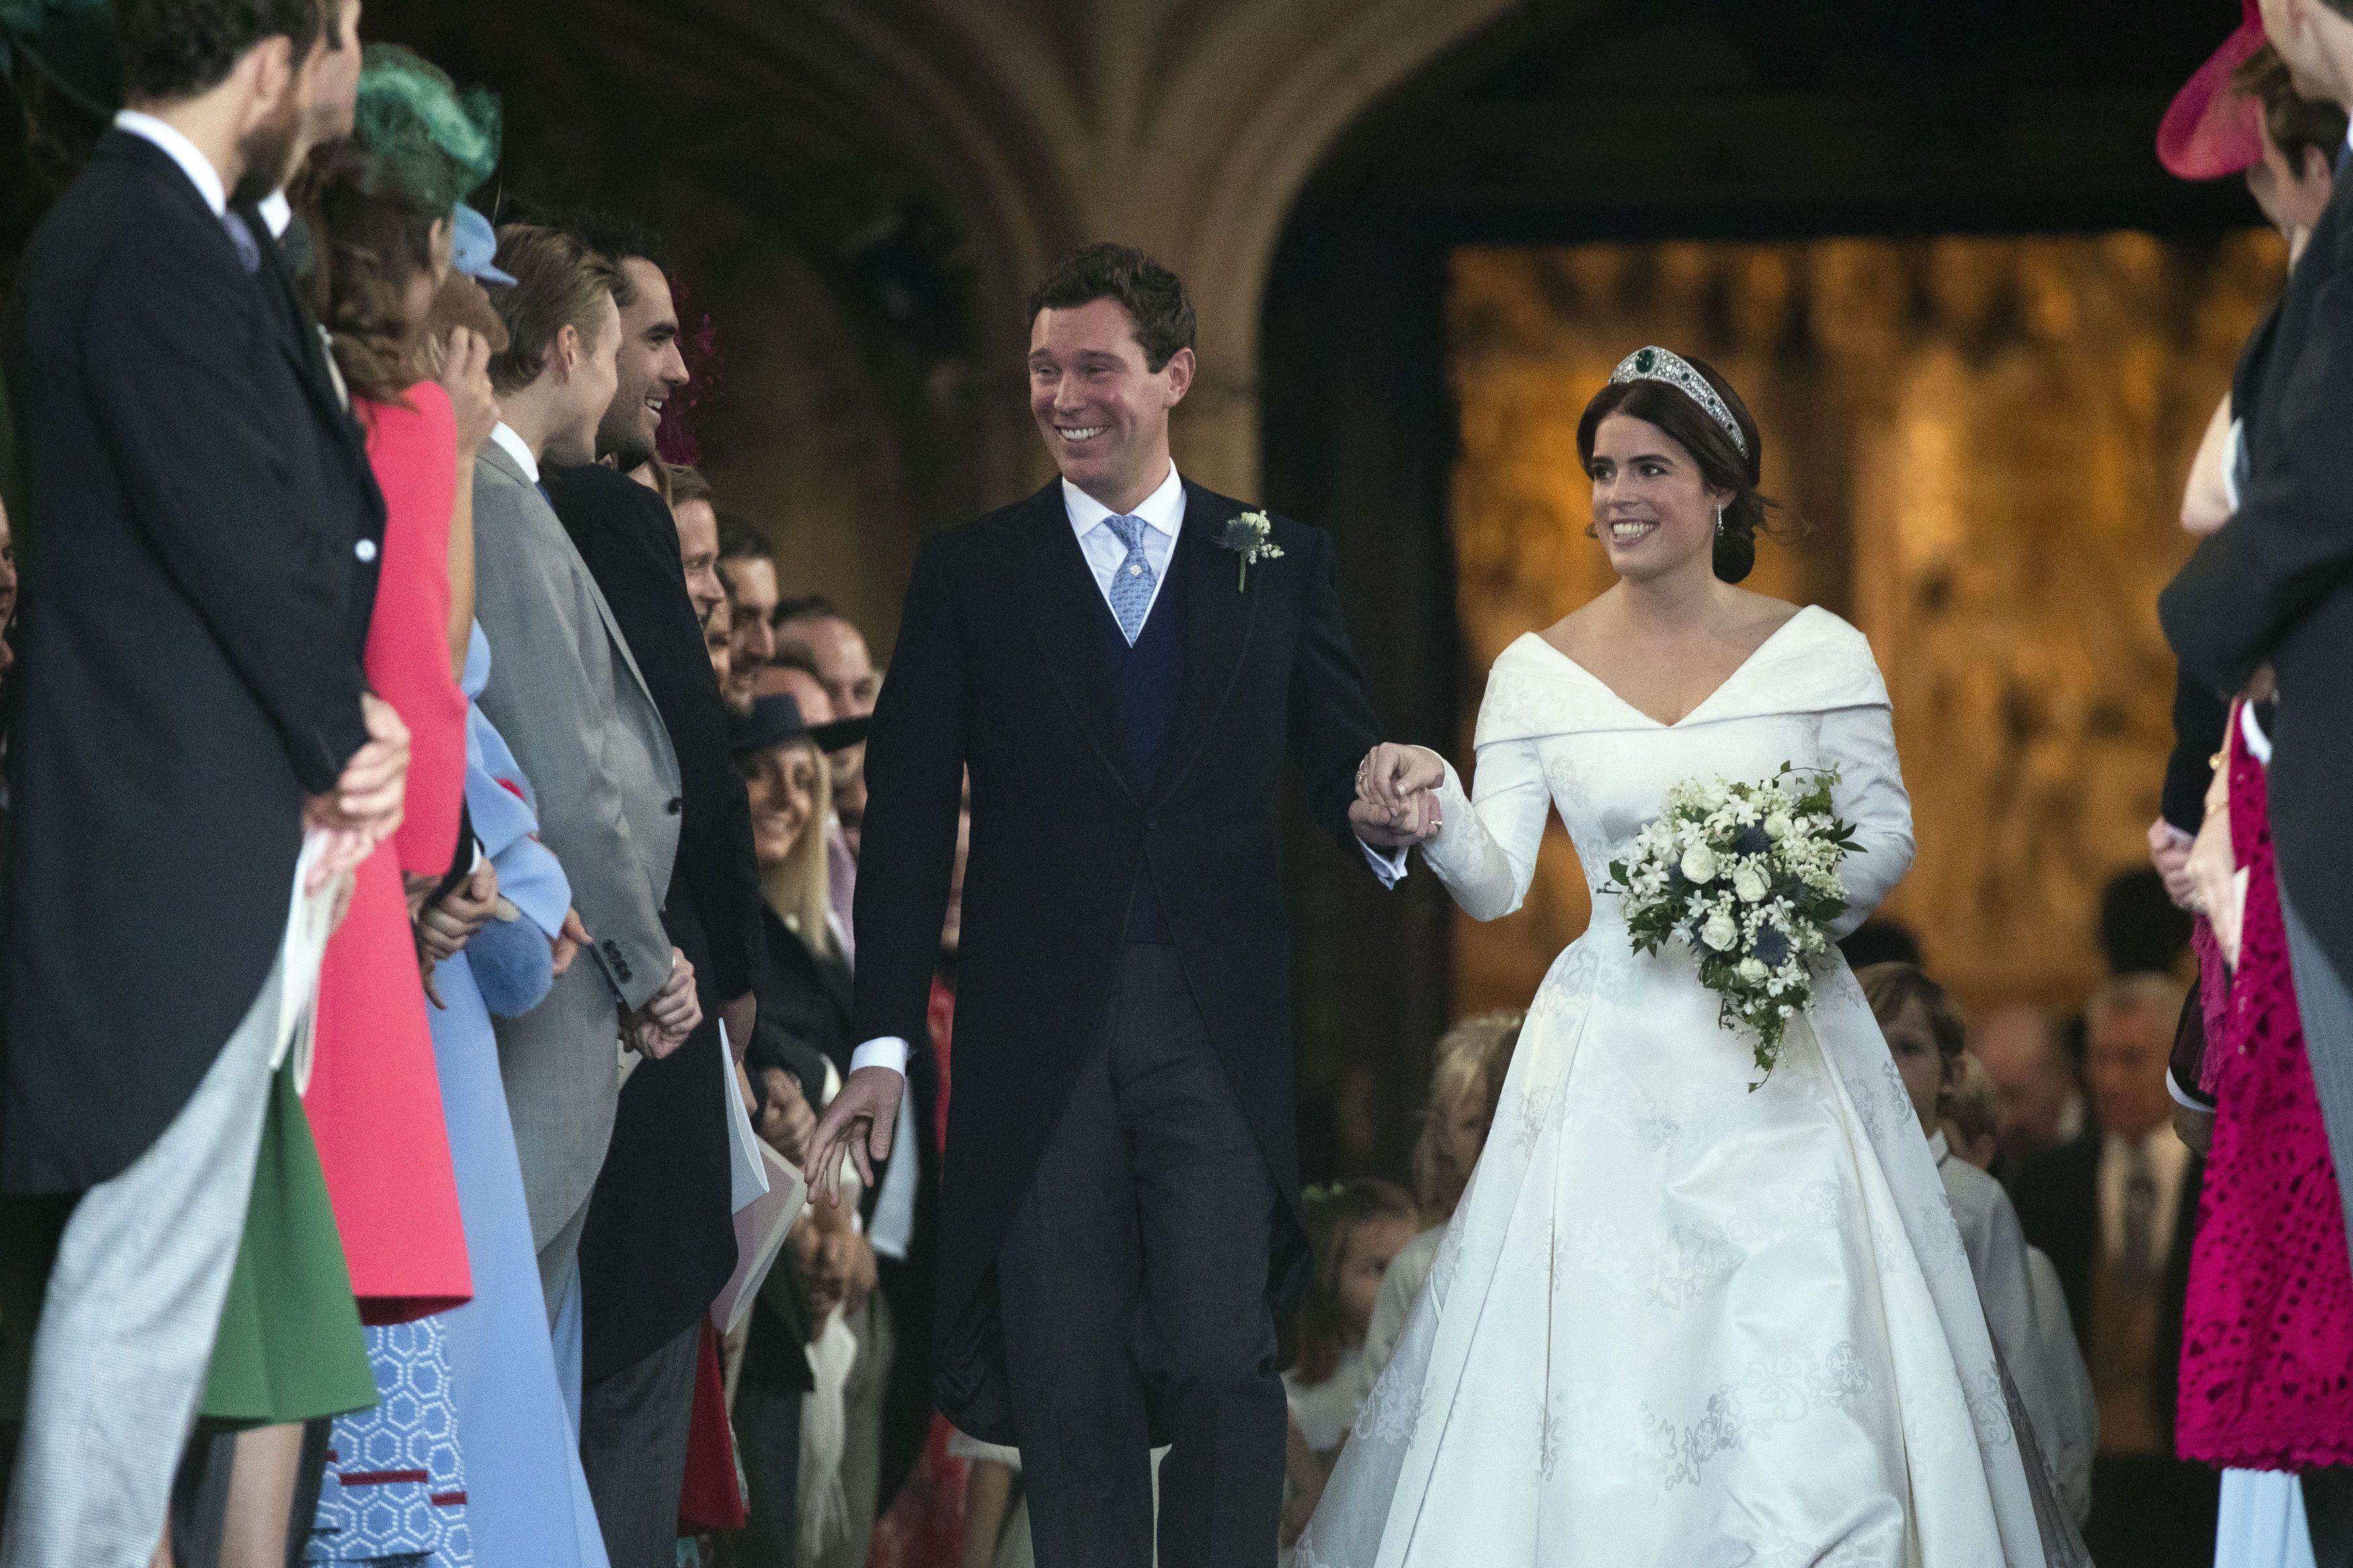 So proud': Duchess of York shares heartfelt message to Prince Andrew So proud': Duchess of York shares heartfelt message to Prince Andrew new foto